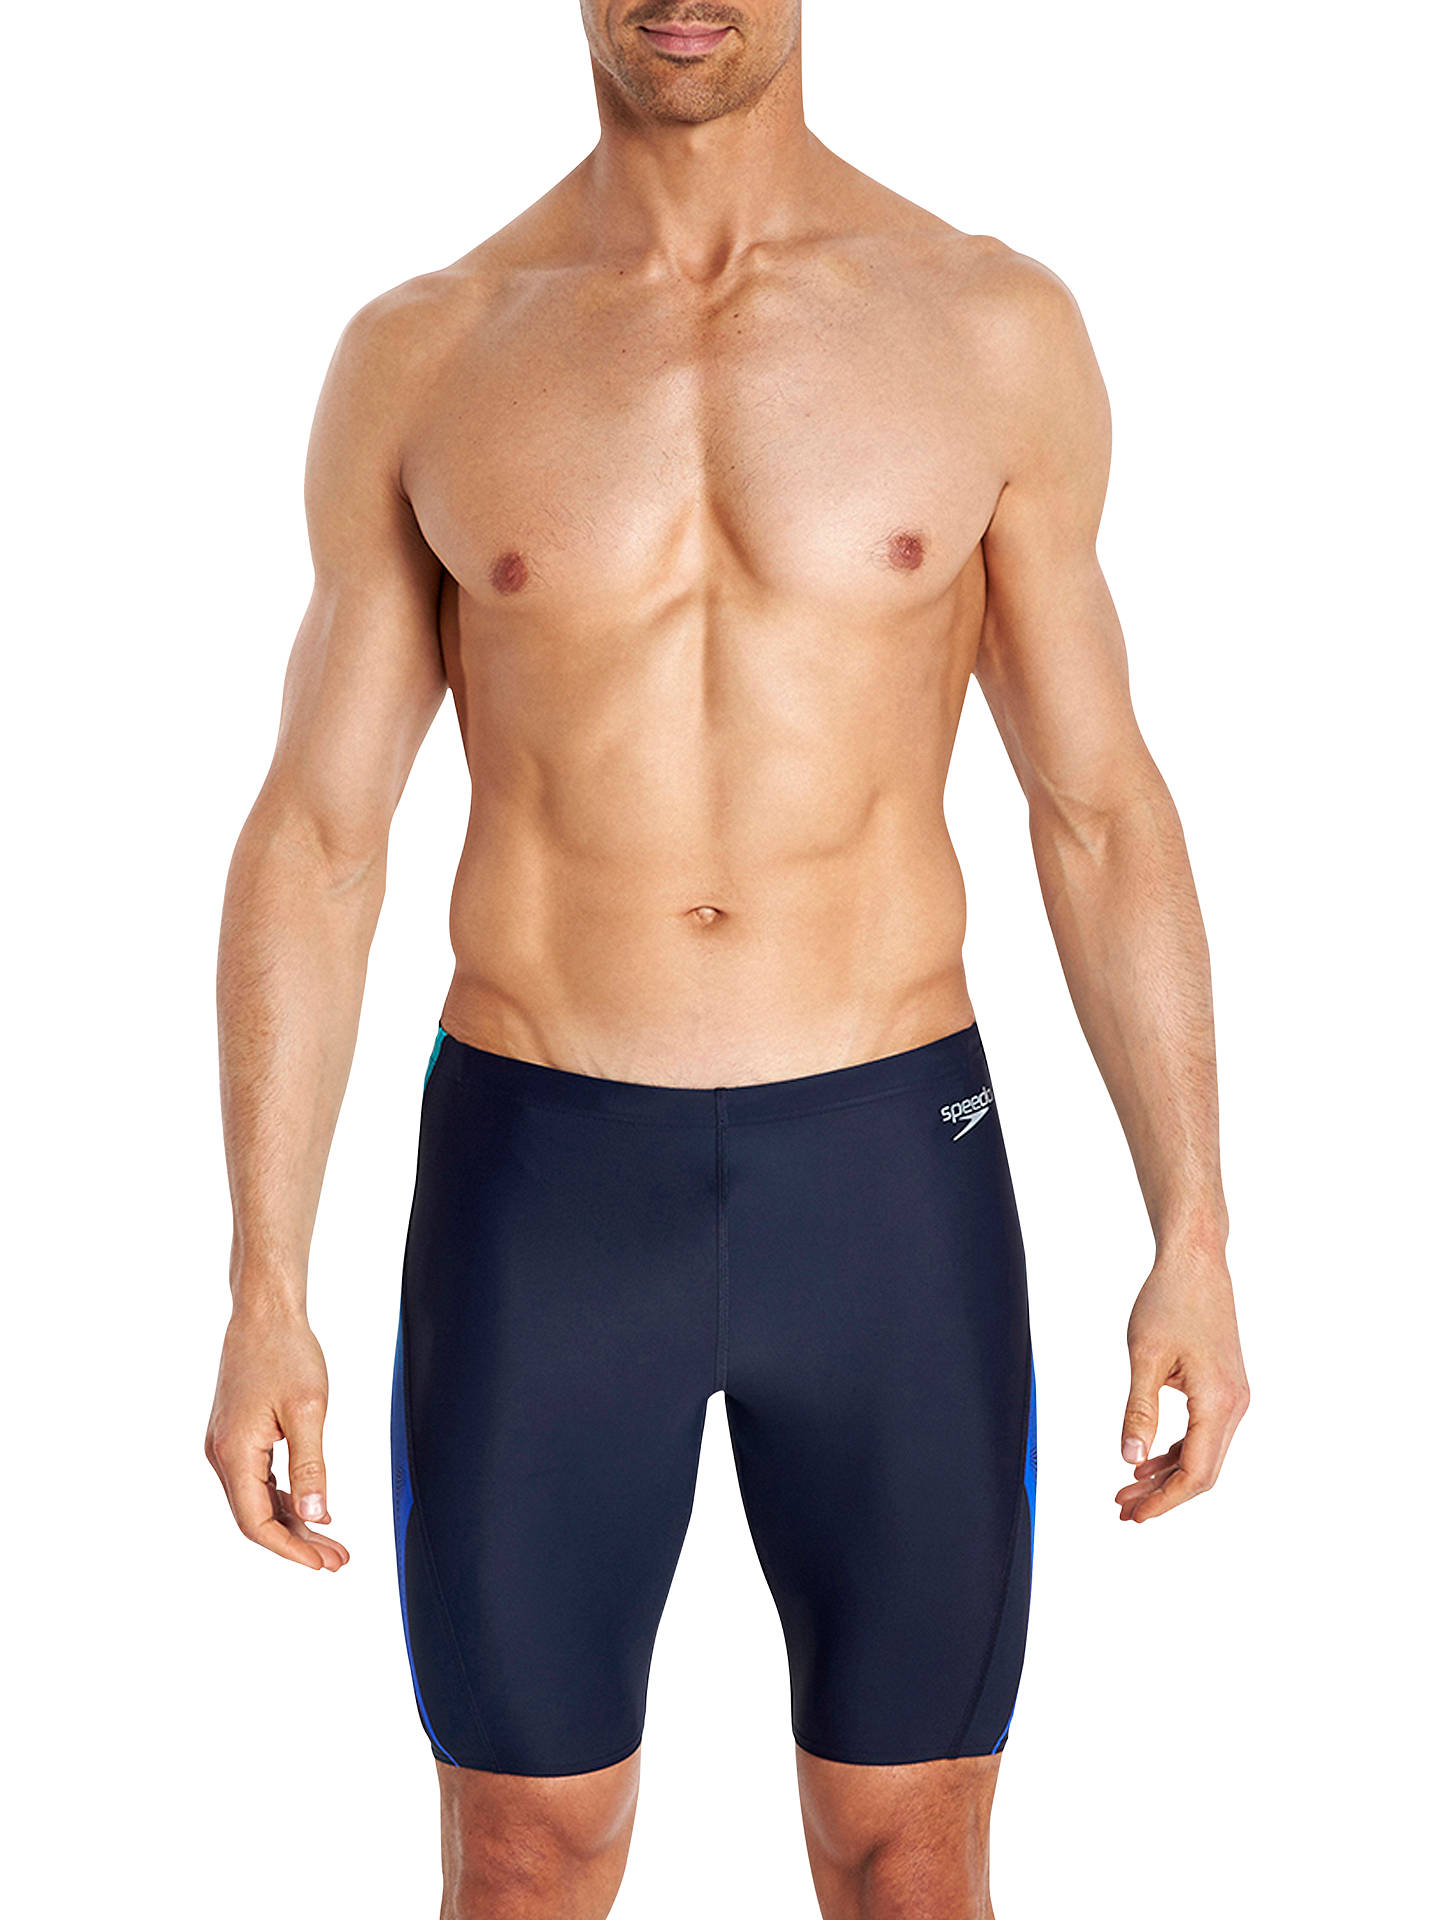 1b987336305bb Speedo Placement Curve Panel Endurance Jammer Swim Shorts at John ...